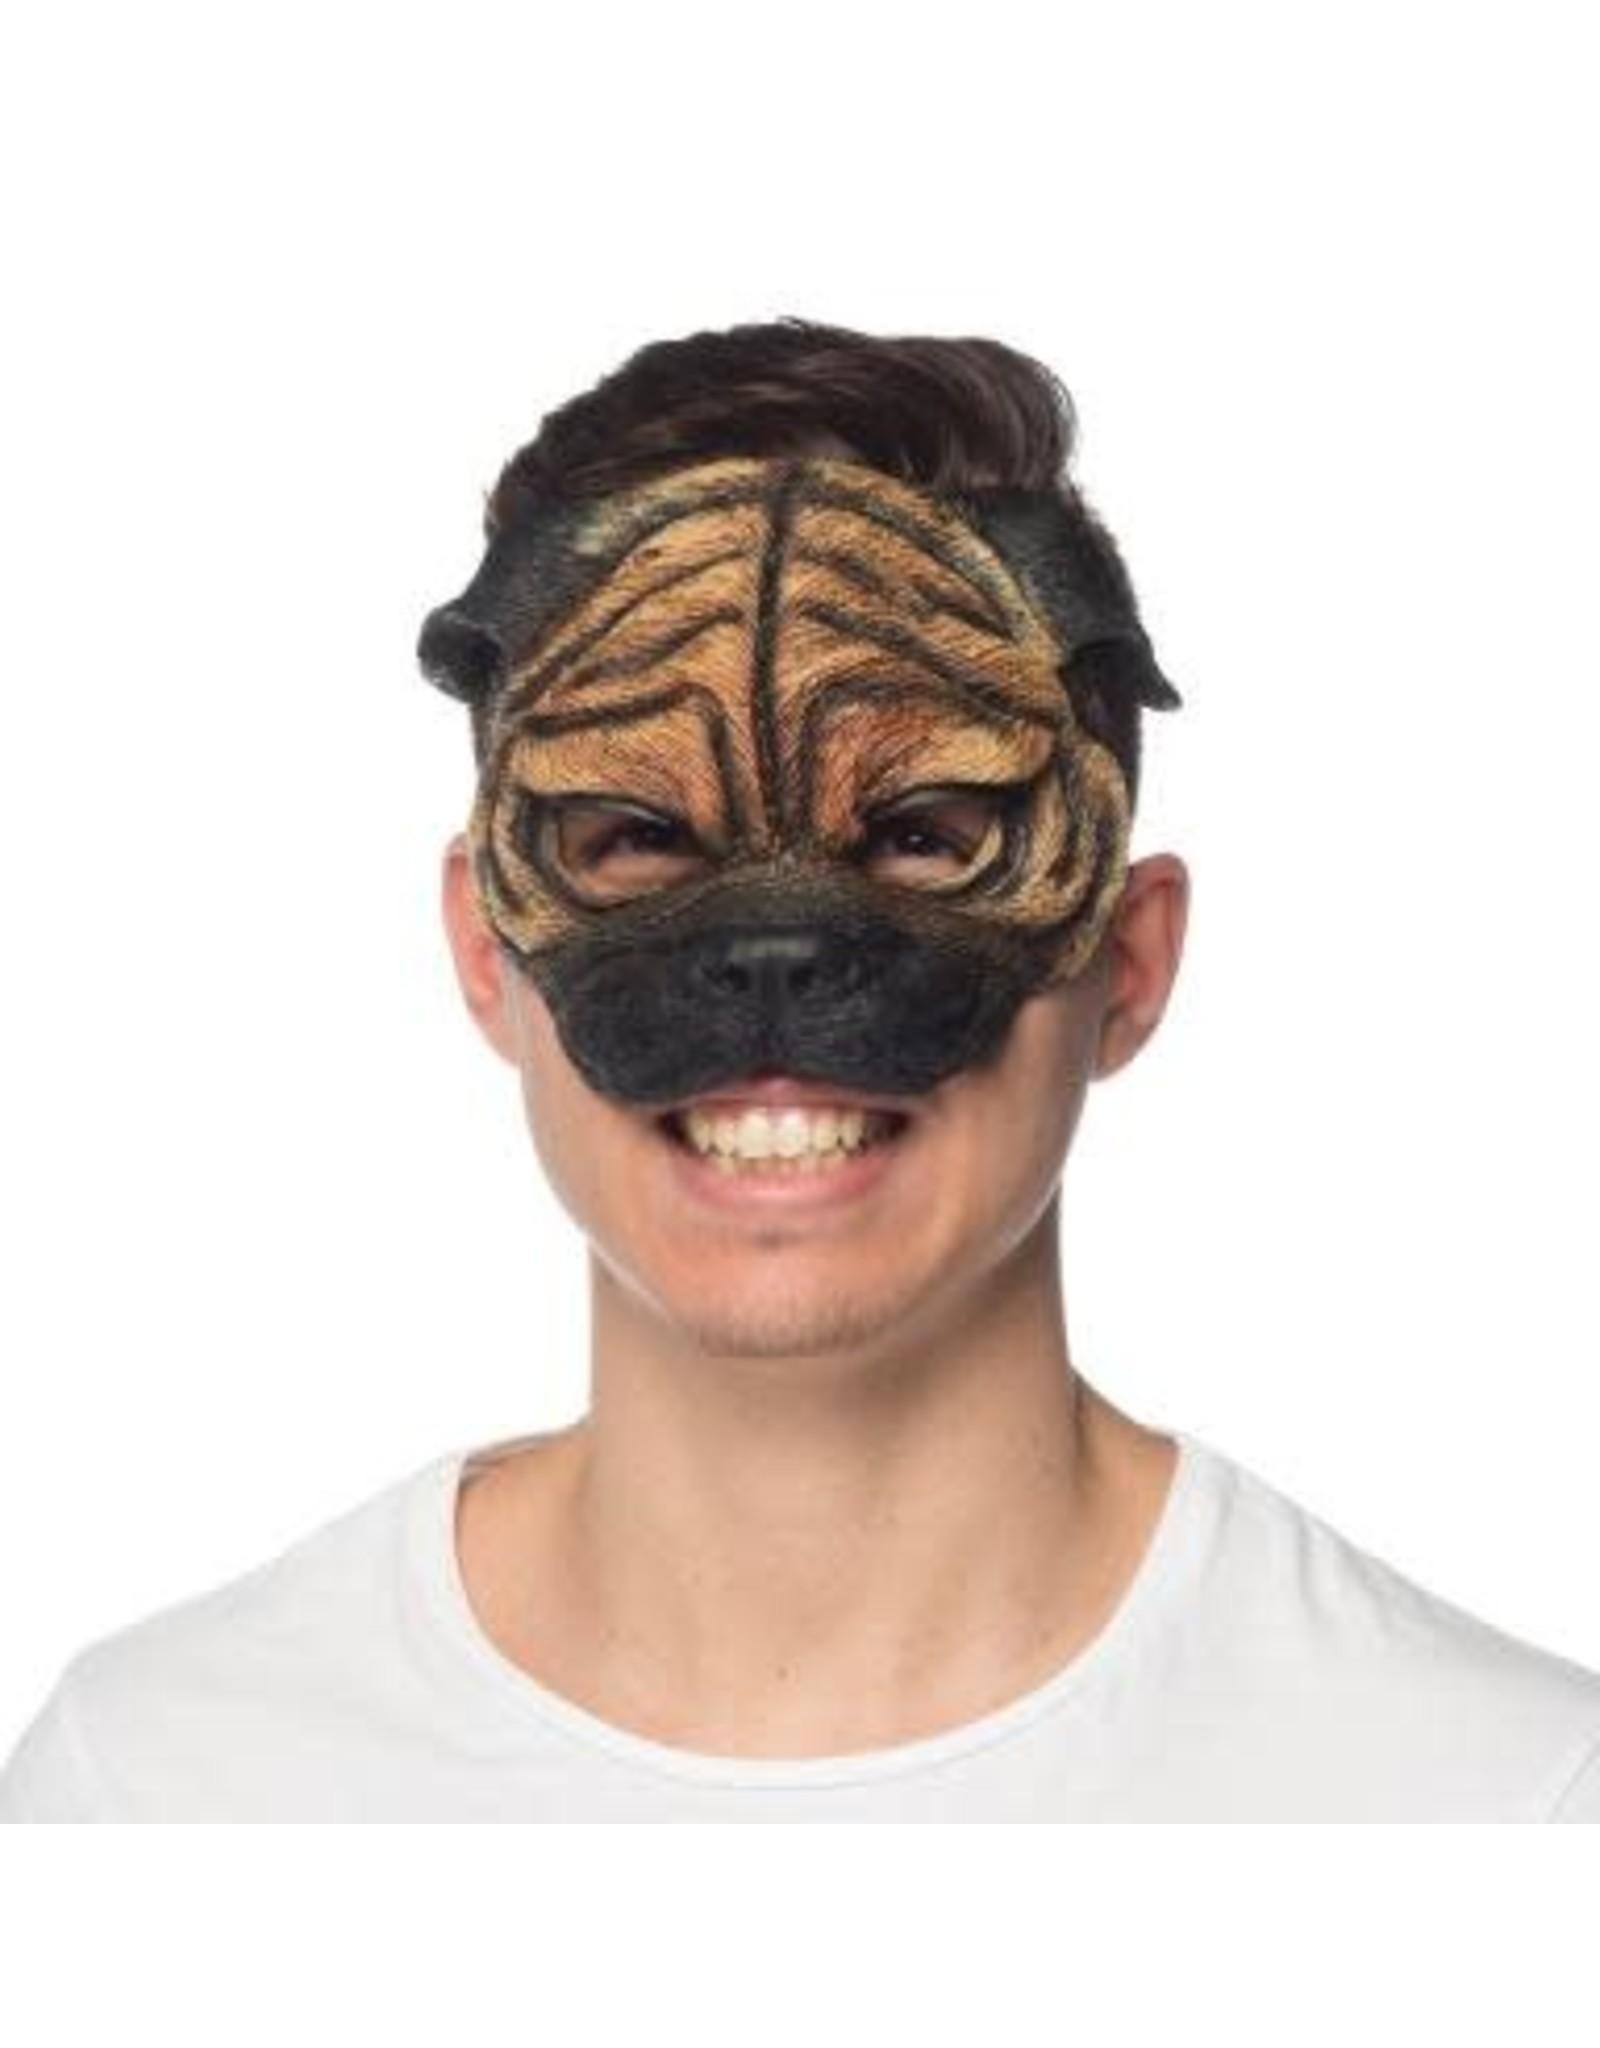 HM Smallwares Pug Mask